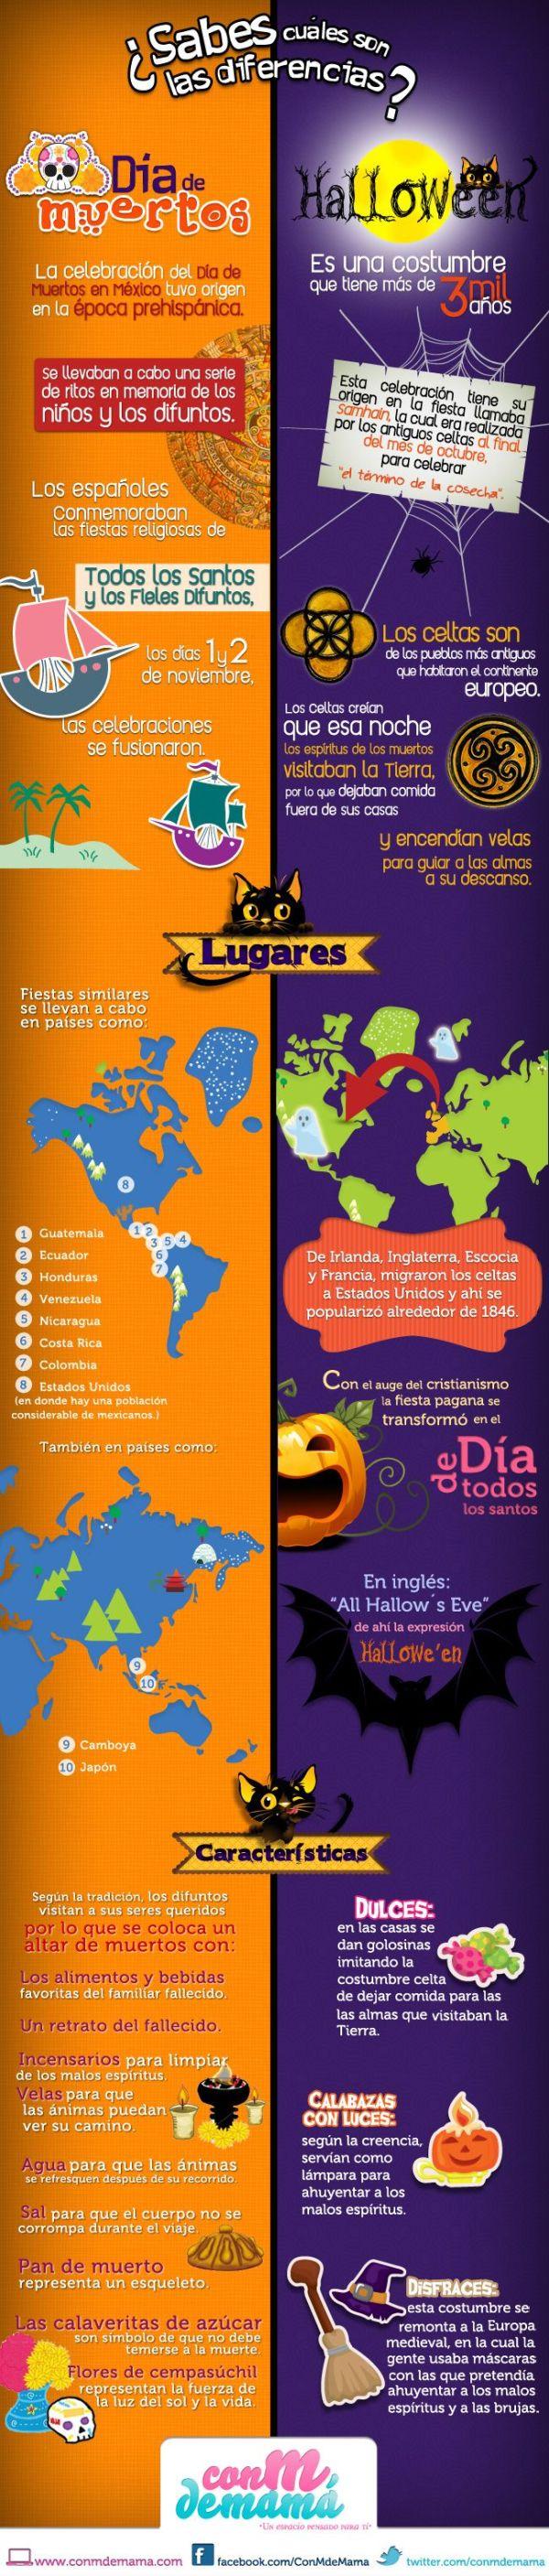 día de muertos Halloween pinterest